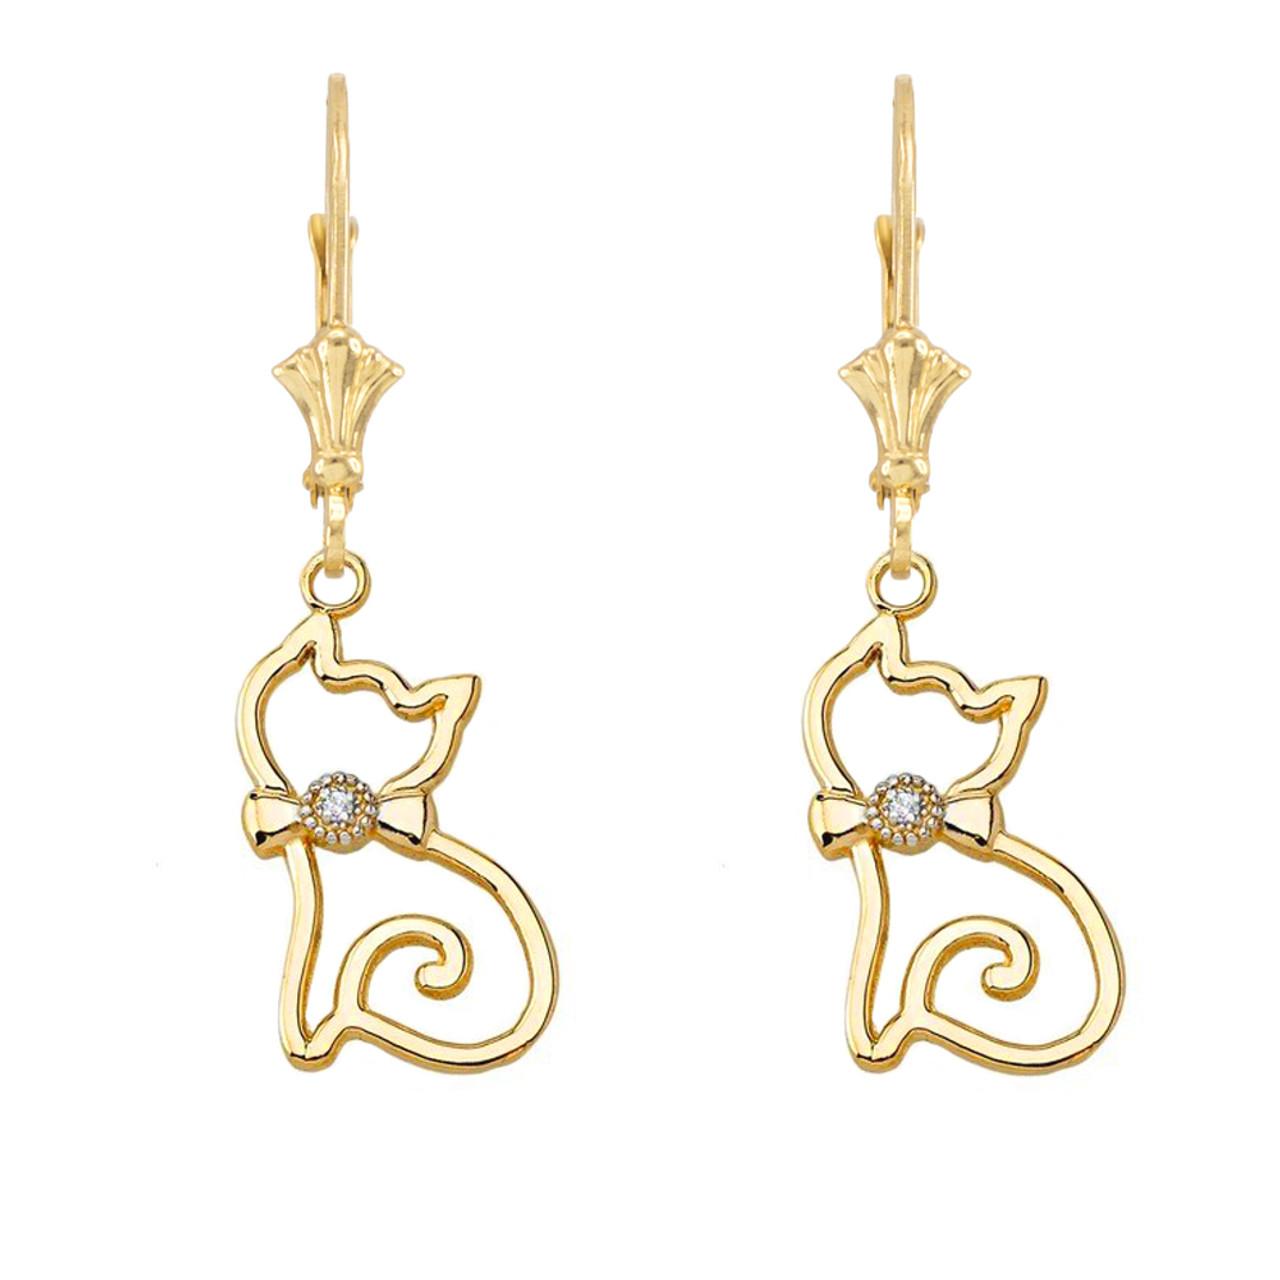 Solid 10k Yellow Gold Openwork Diamond  Cat Pendant Necklace